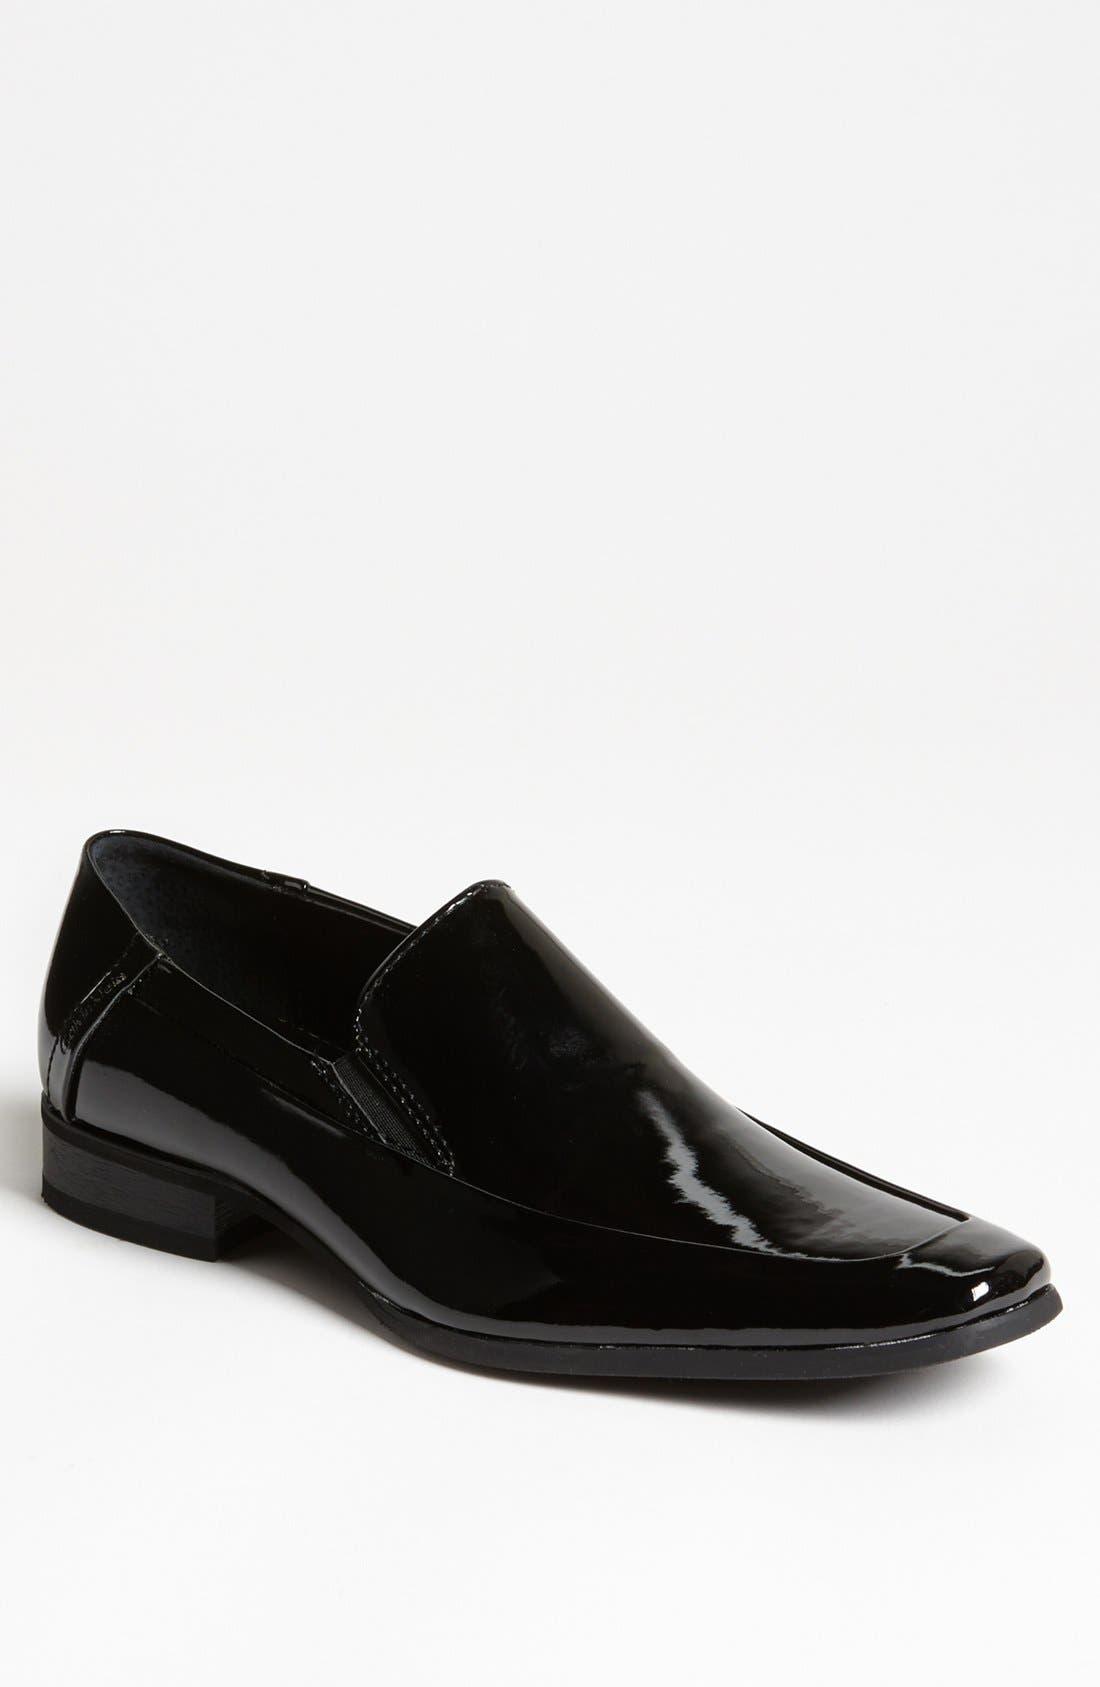 Alternate Image 1 Selected - Calvin Klein 'Brad' Loafer